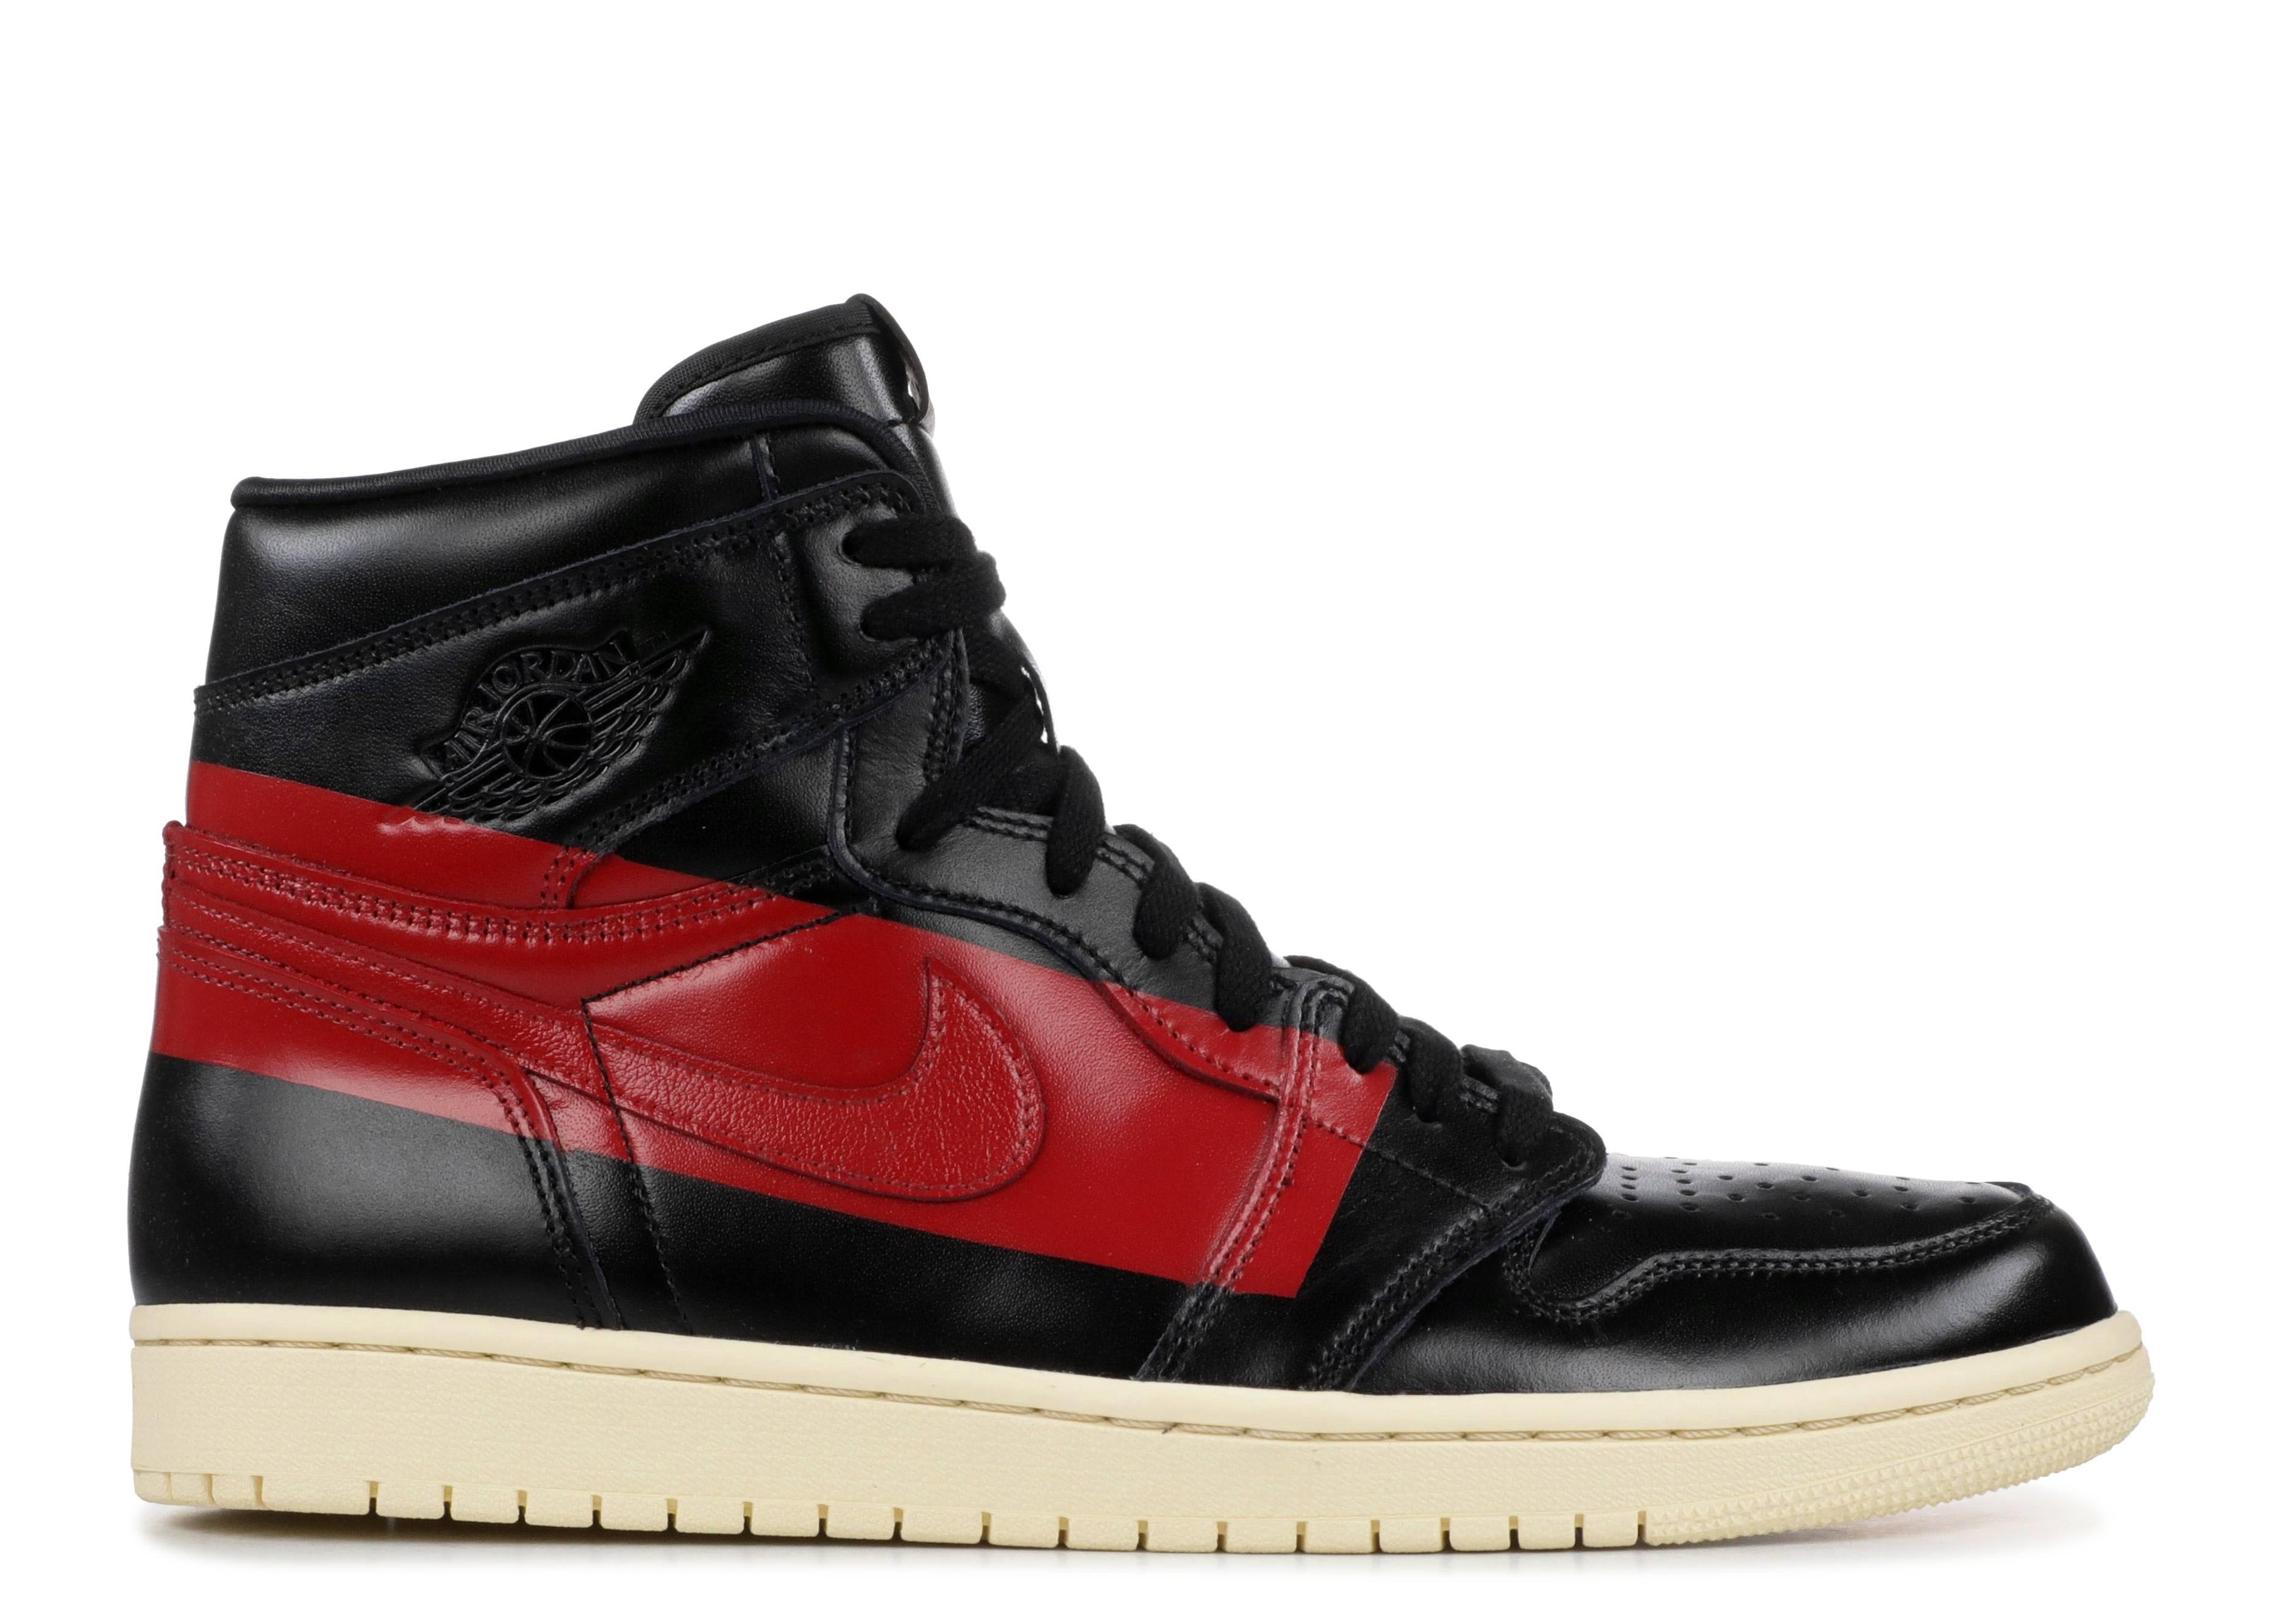 buy online 43c01 d2a12 Air Jordan 1 (I) Shoes - Nike   Flight Club